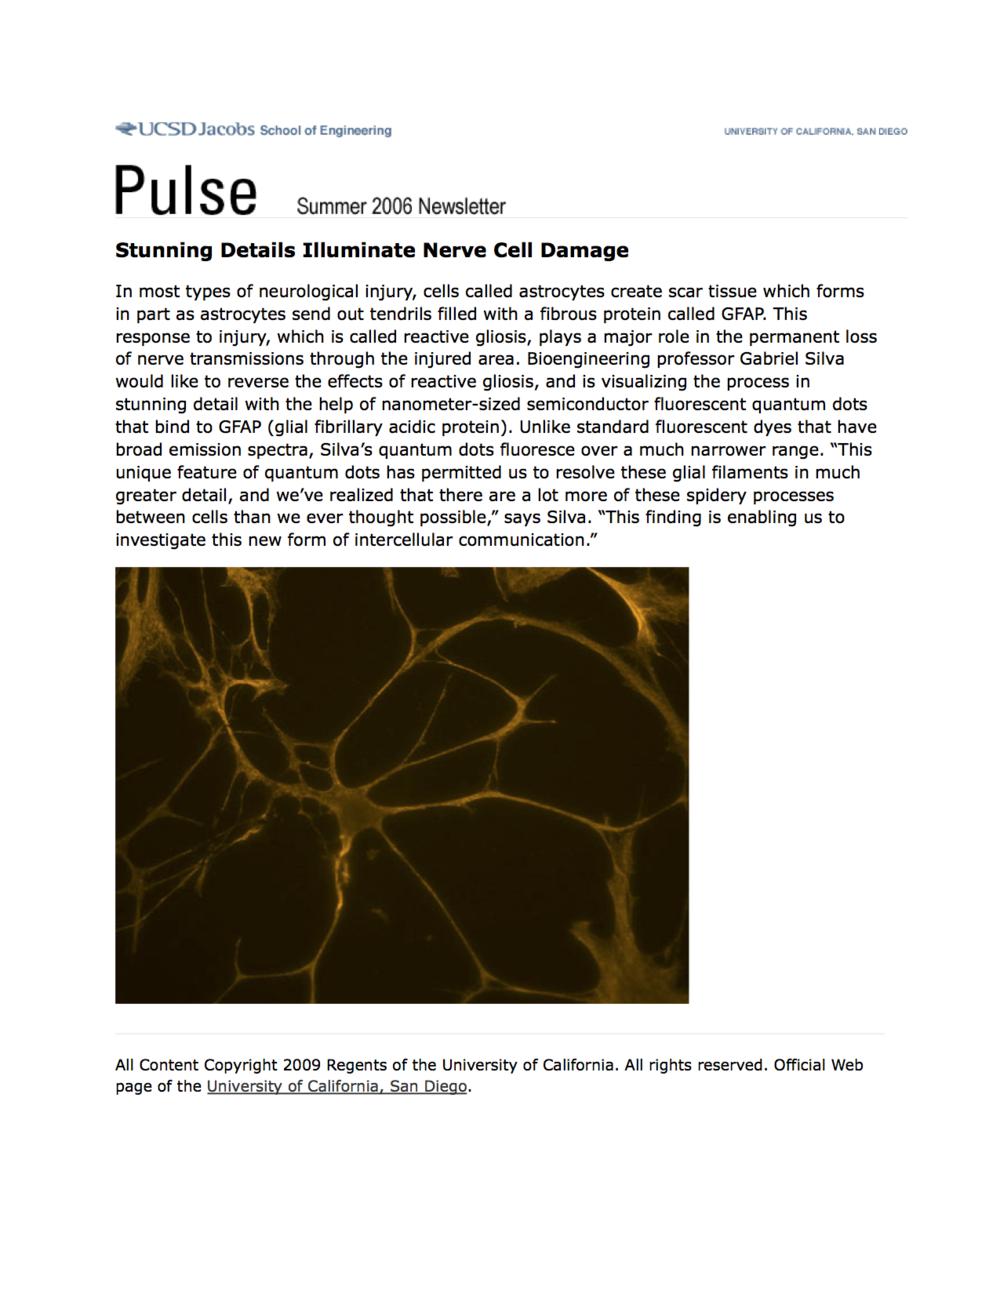 Neuroscientists Illuminate Role Of >> Stunning Details Illuminate Nerve Cell Damage Mathematical